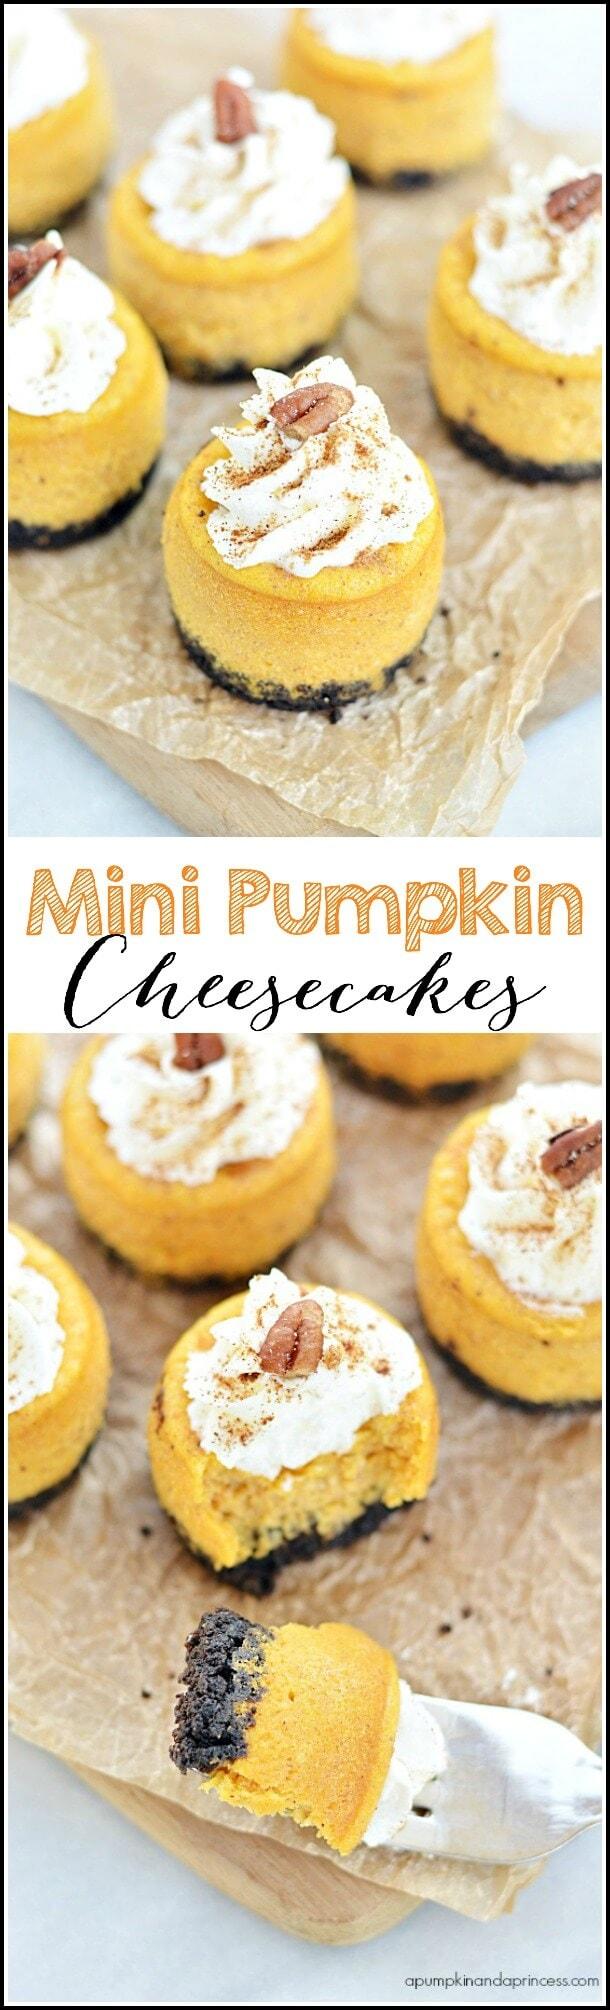 Pumpkin-Cheesecakes-Recipe